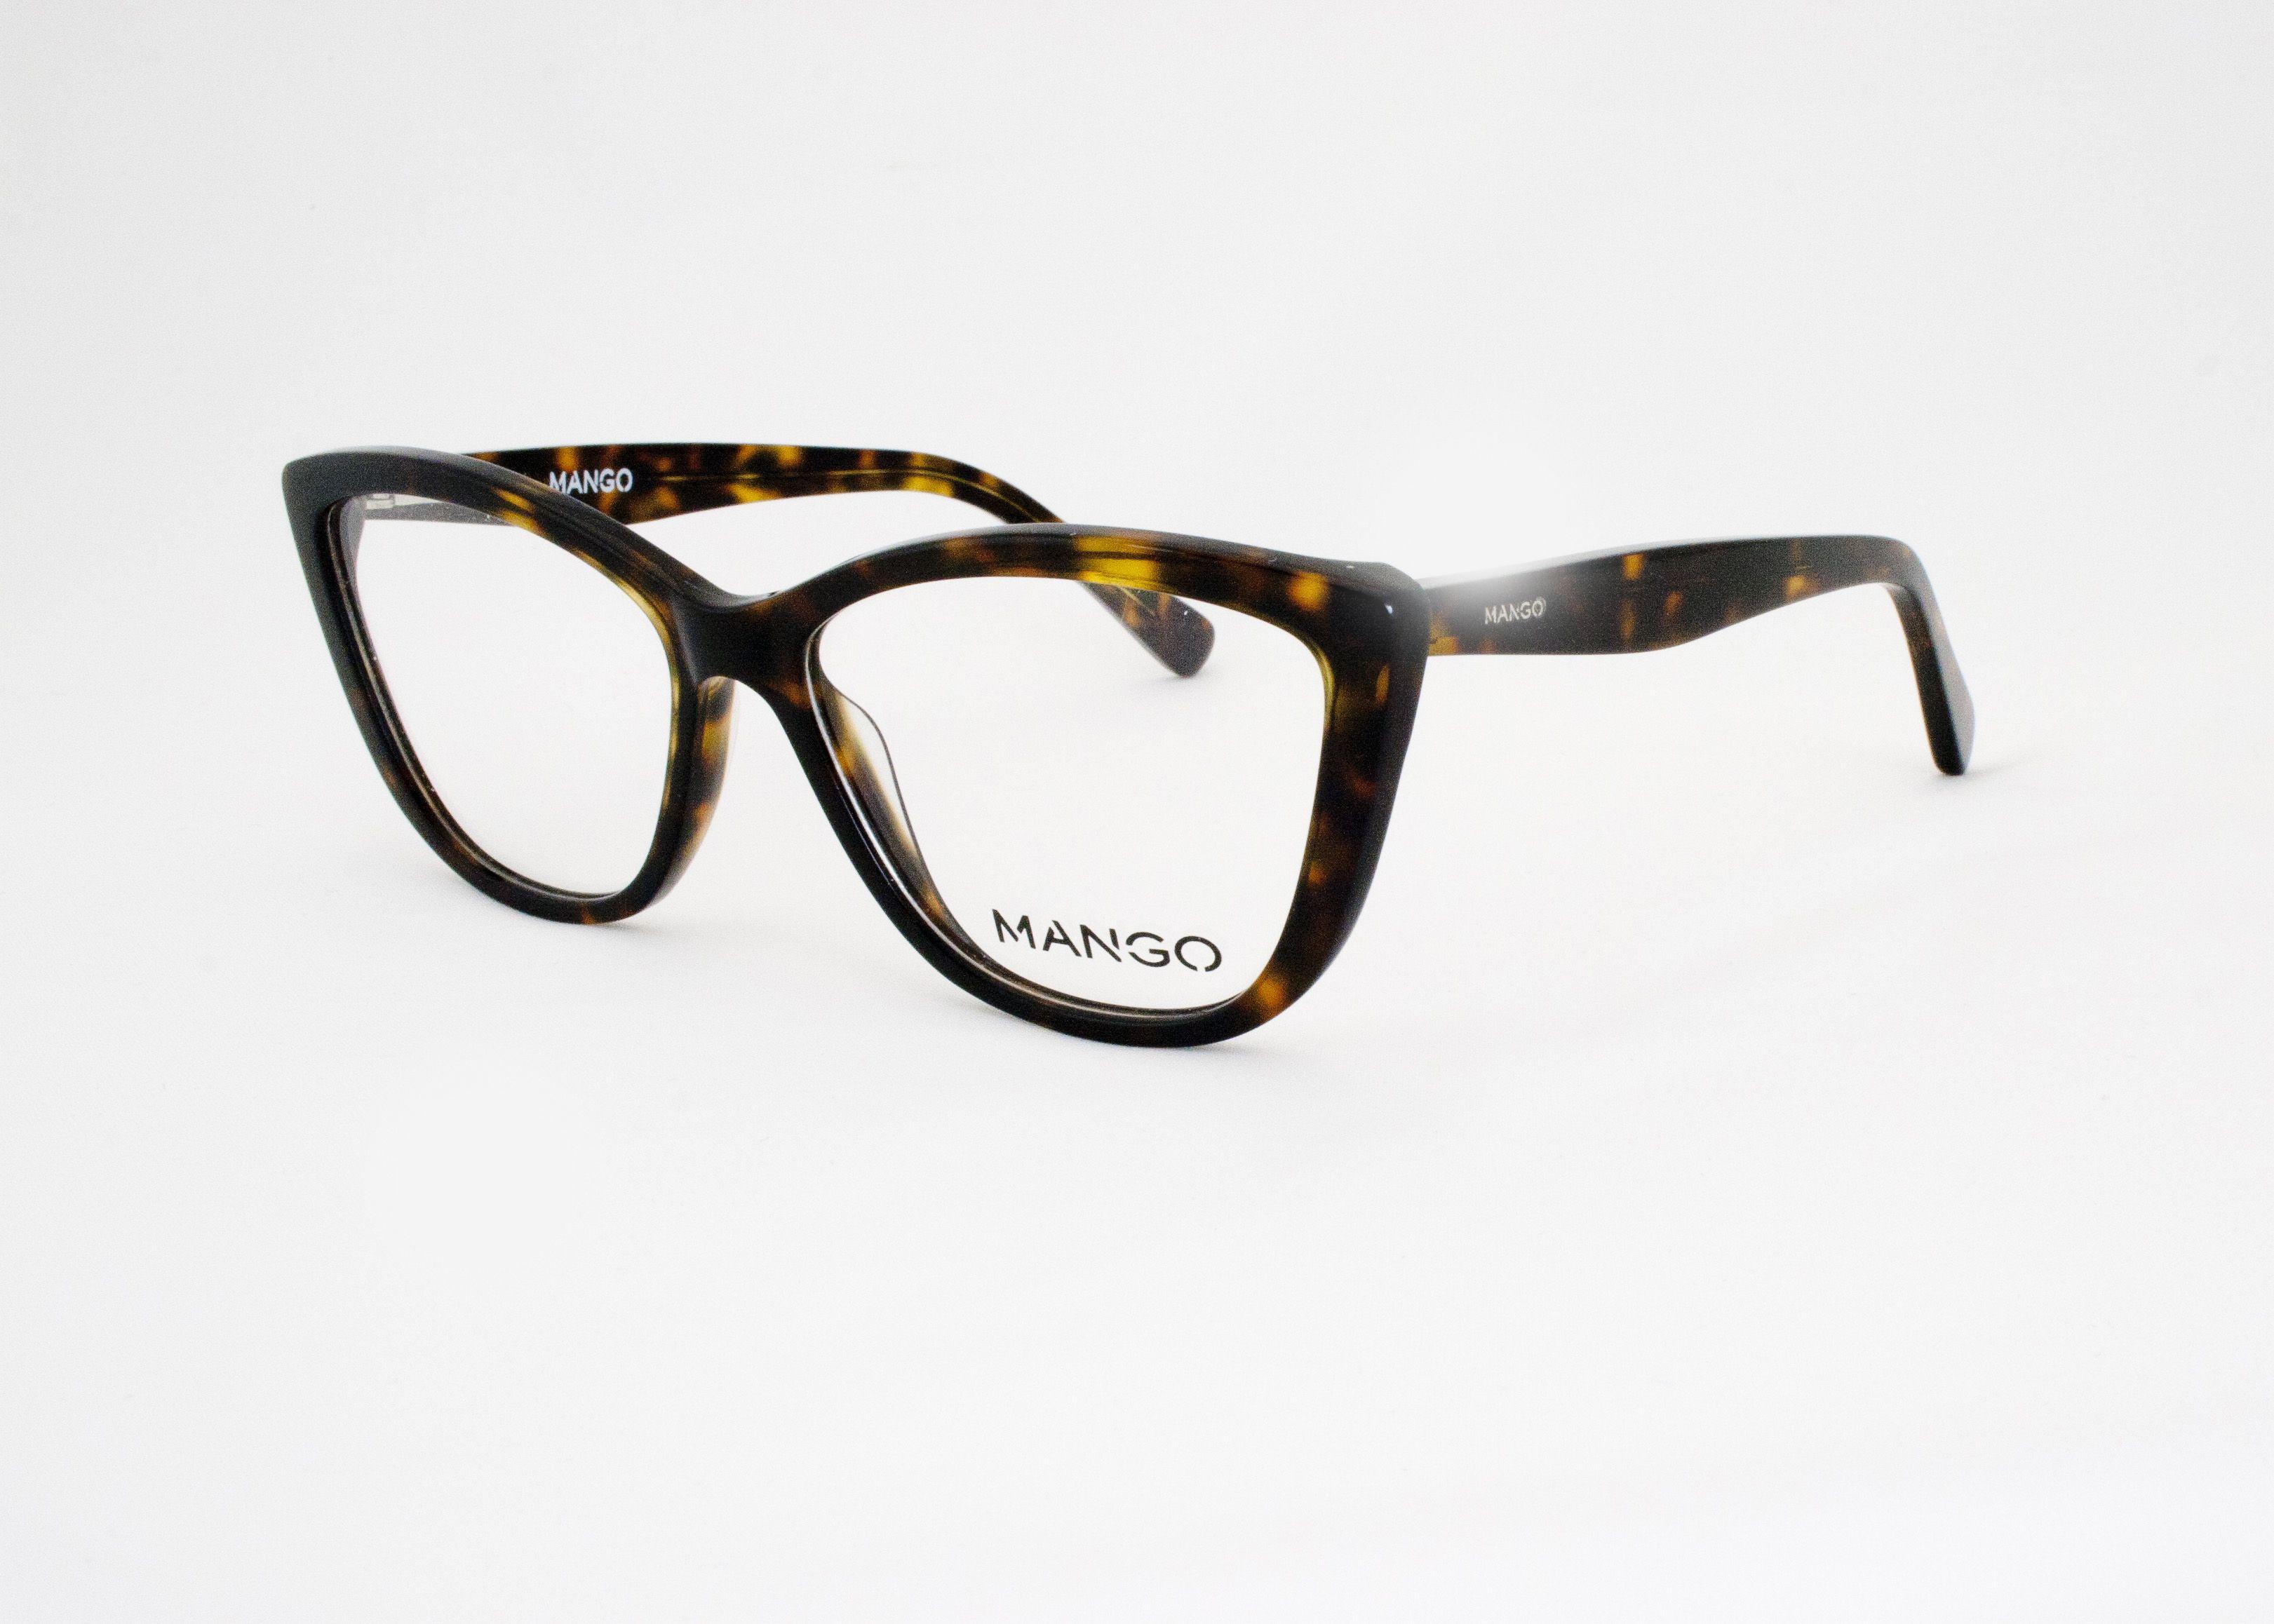 Gafas Mango. Colección 2014